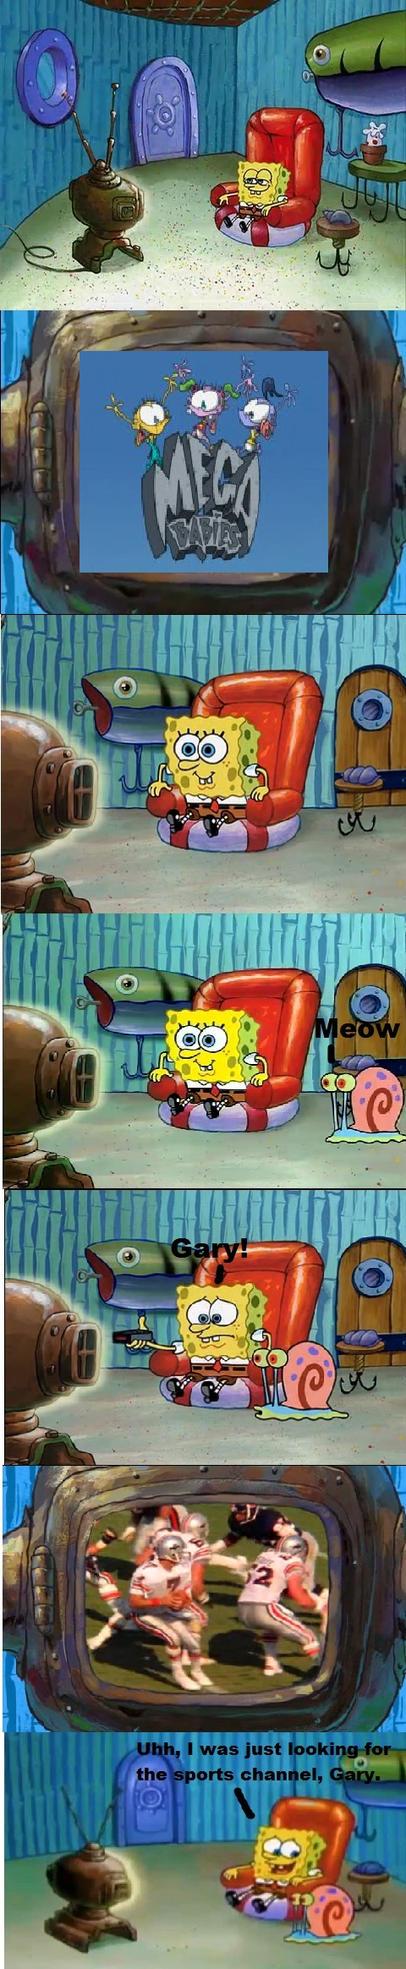 Spongebob Loves Mega Babies by Sovietlollipop